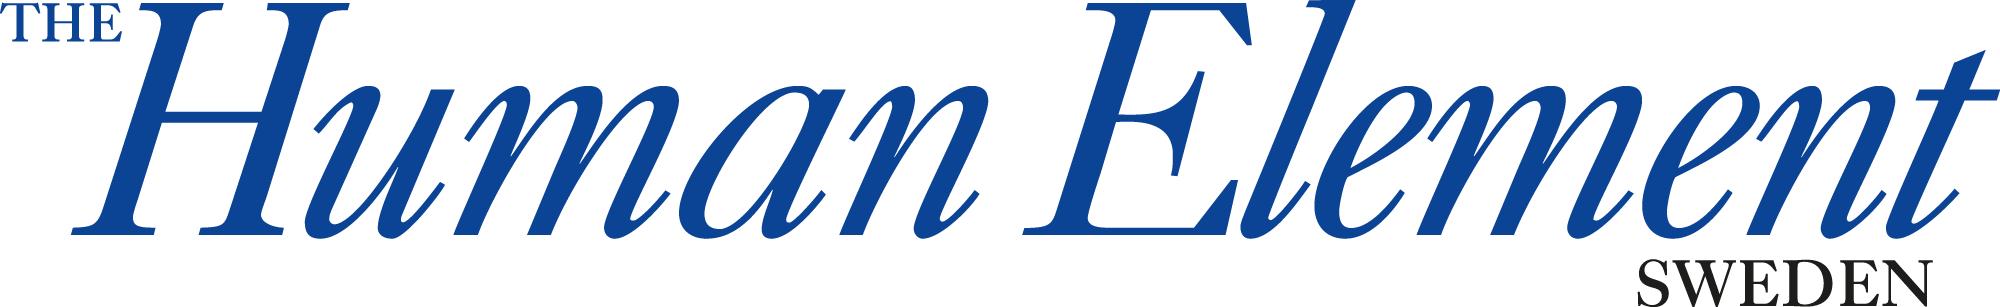 THE-Sweden-logo-2000px